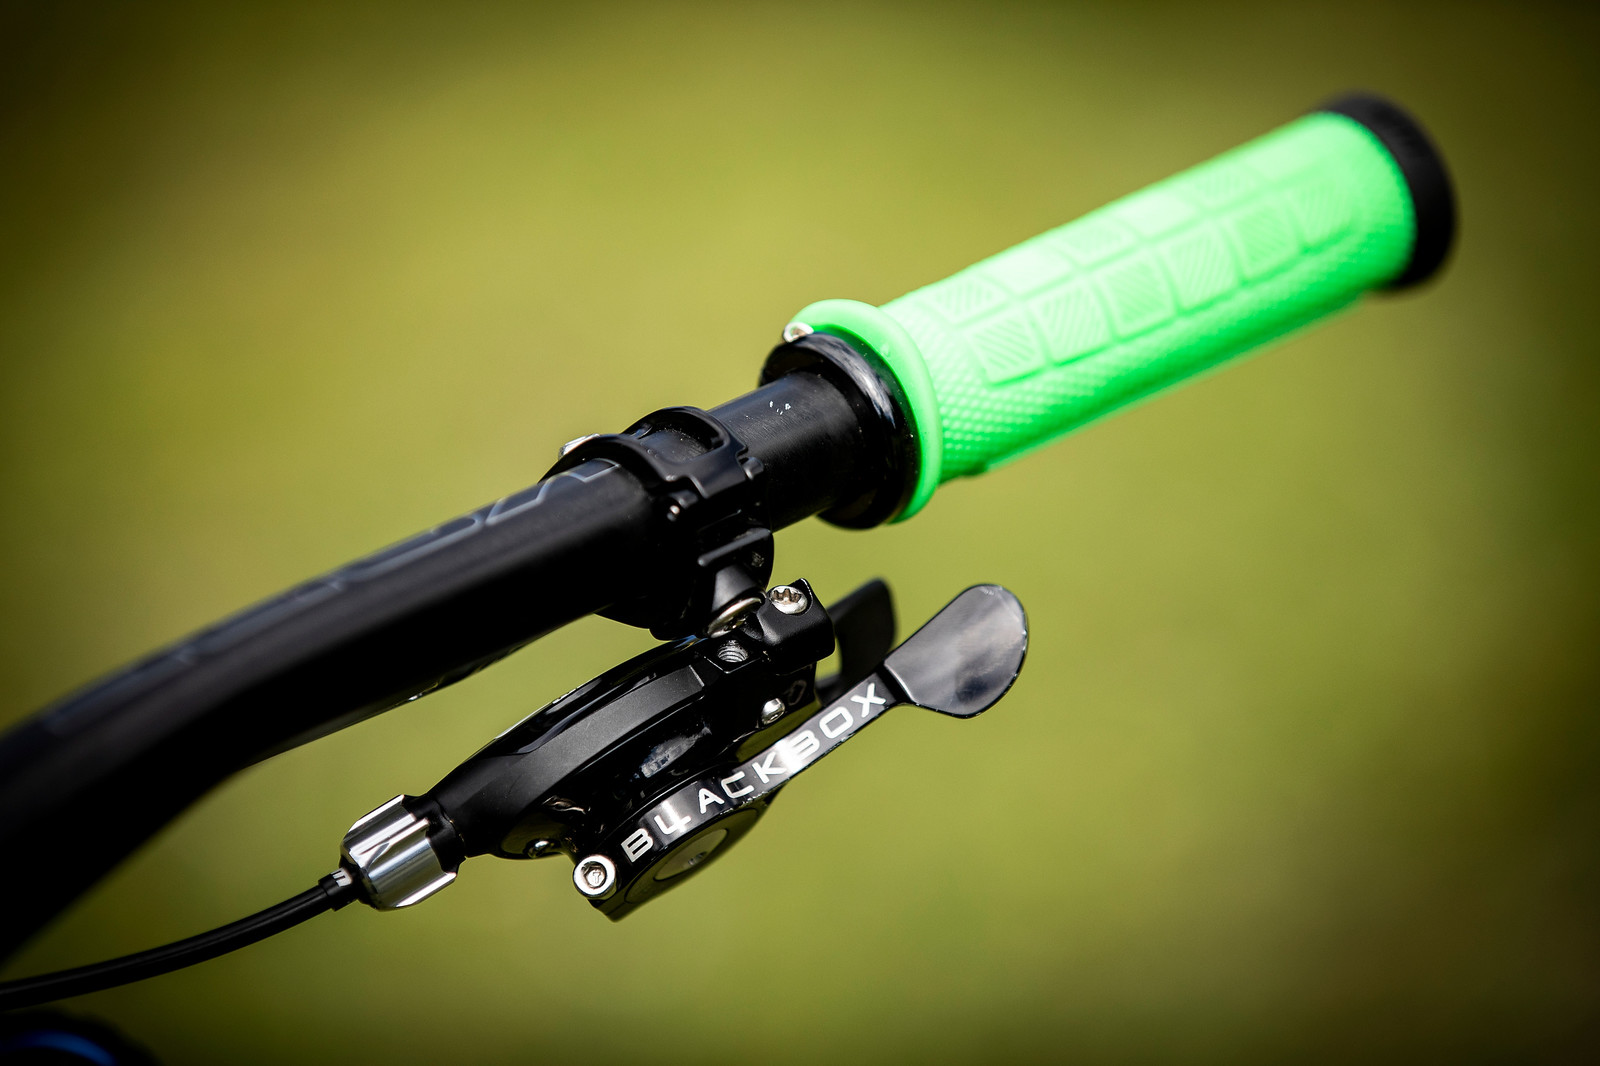 Green Grip Goodness - WORLD CHAMPS BIKE - Connor Fearon's Kona Operator - Mountain Biking Pictures - Vital MTB